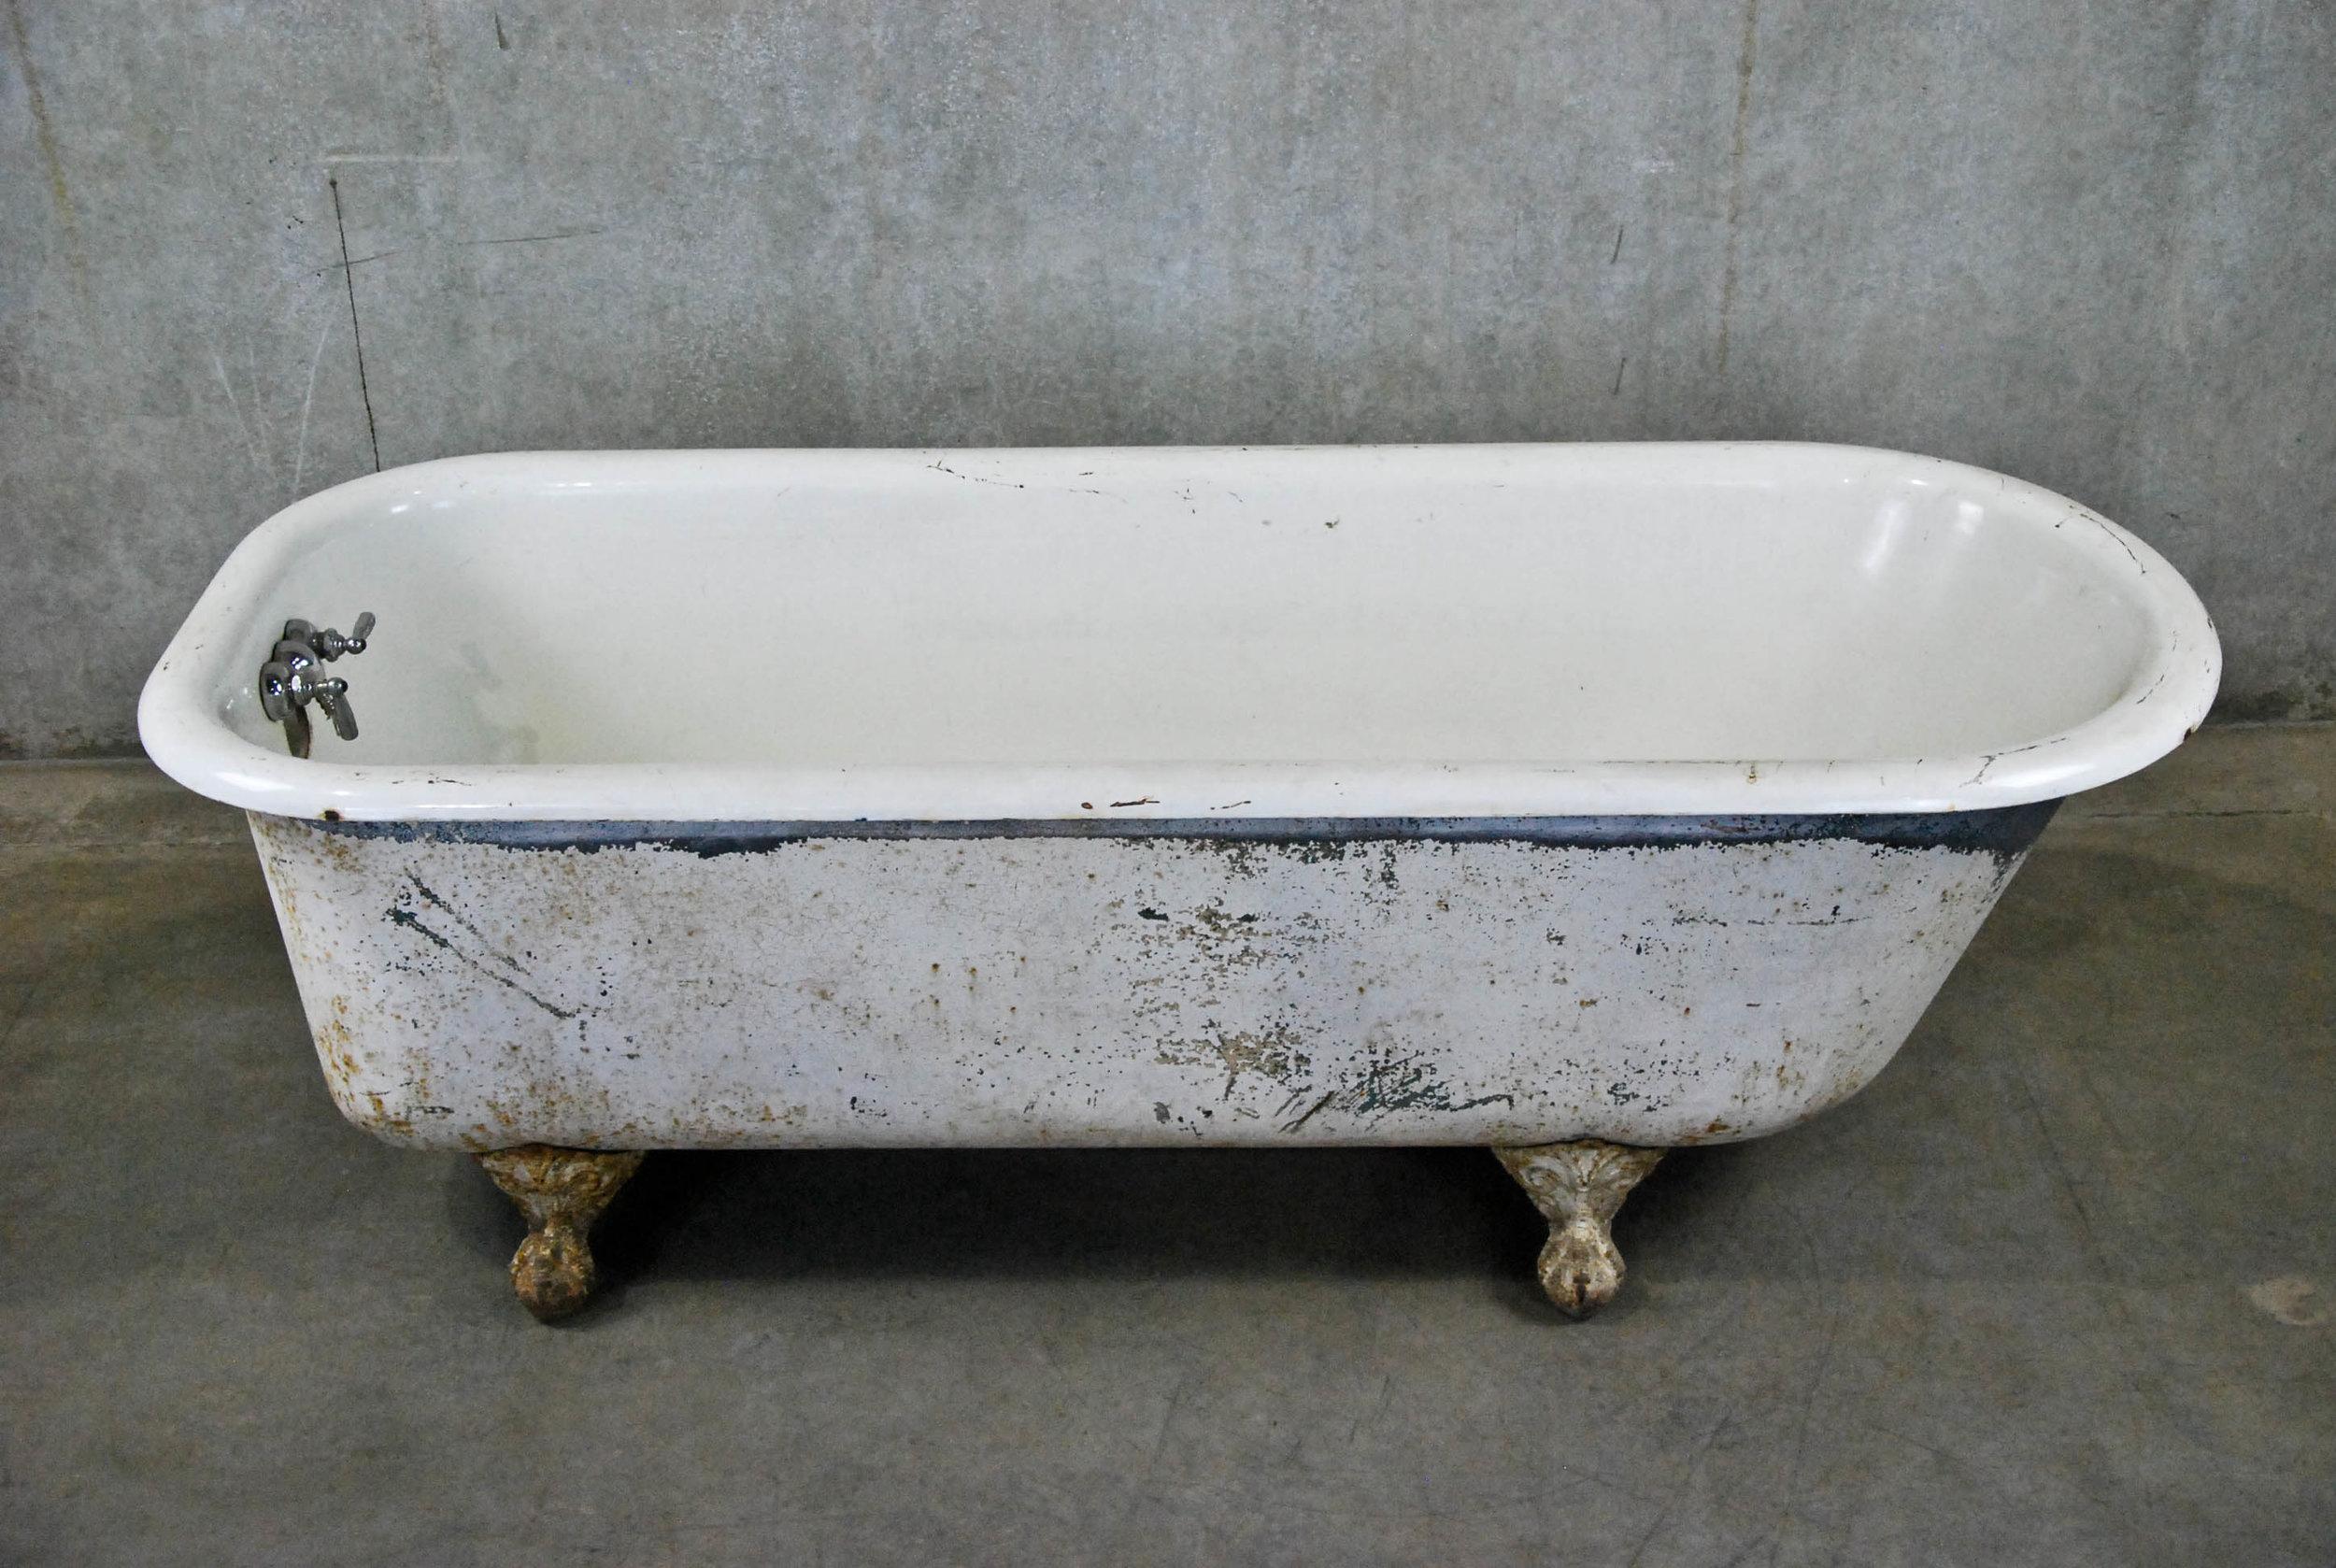 Scott Landon Antiques & Interiors-1900 Oversized Cast Iron Clawfoot Tub